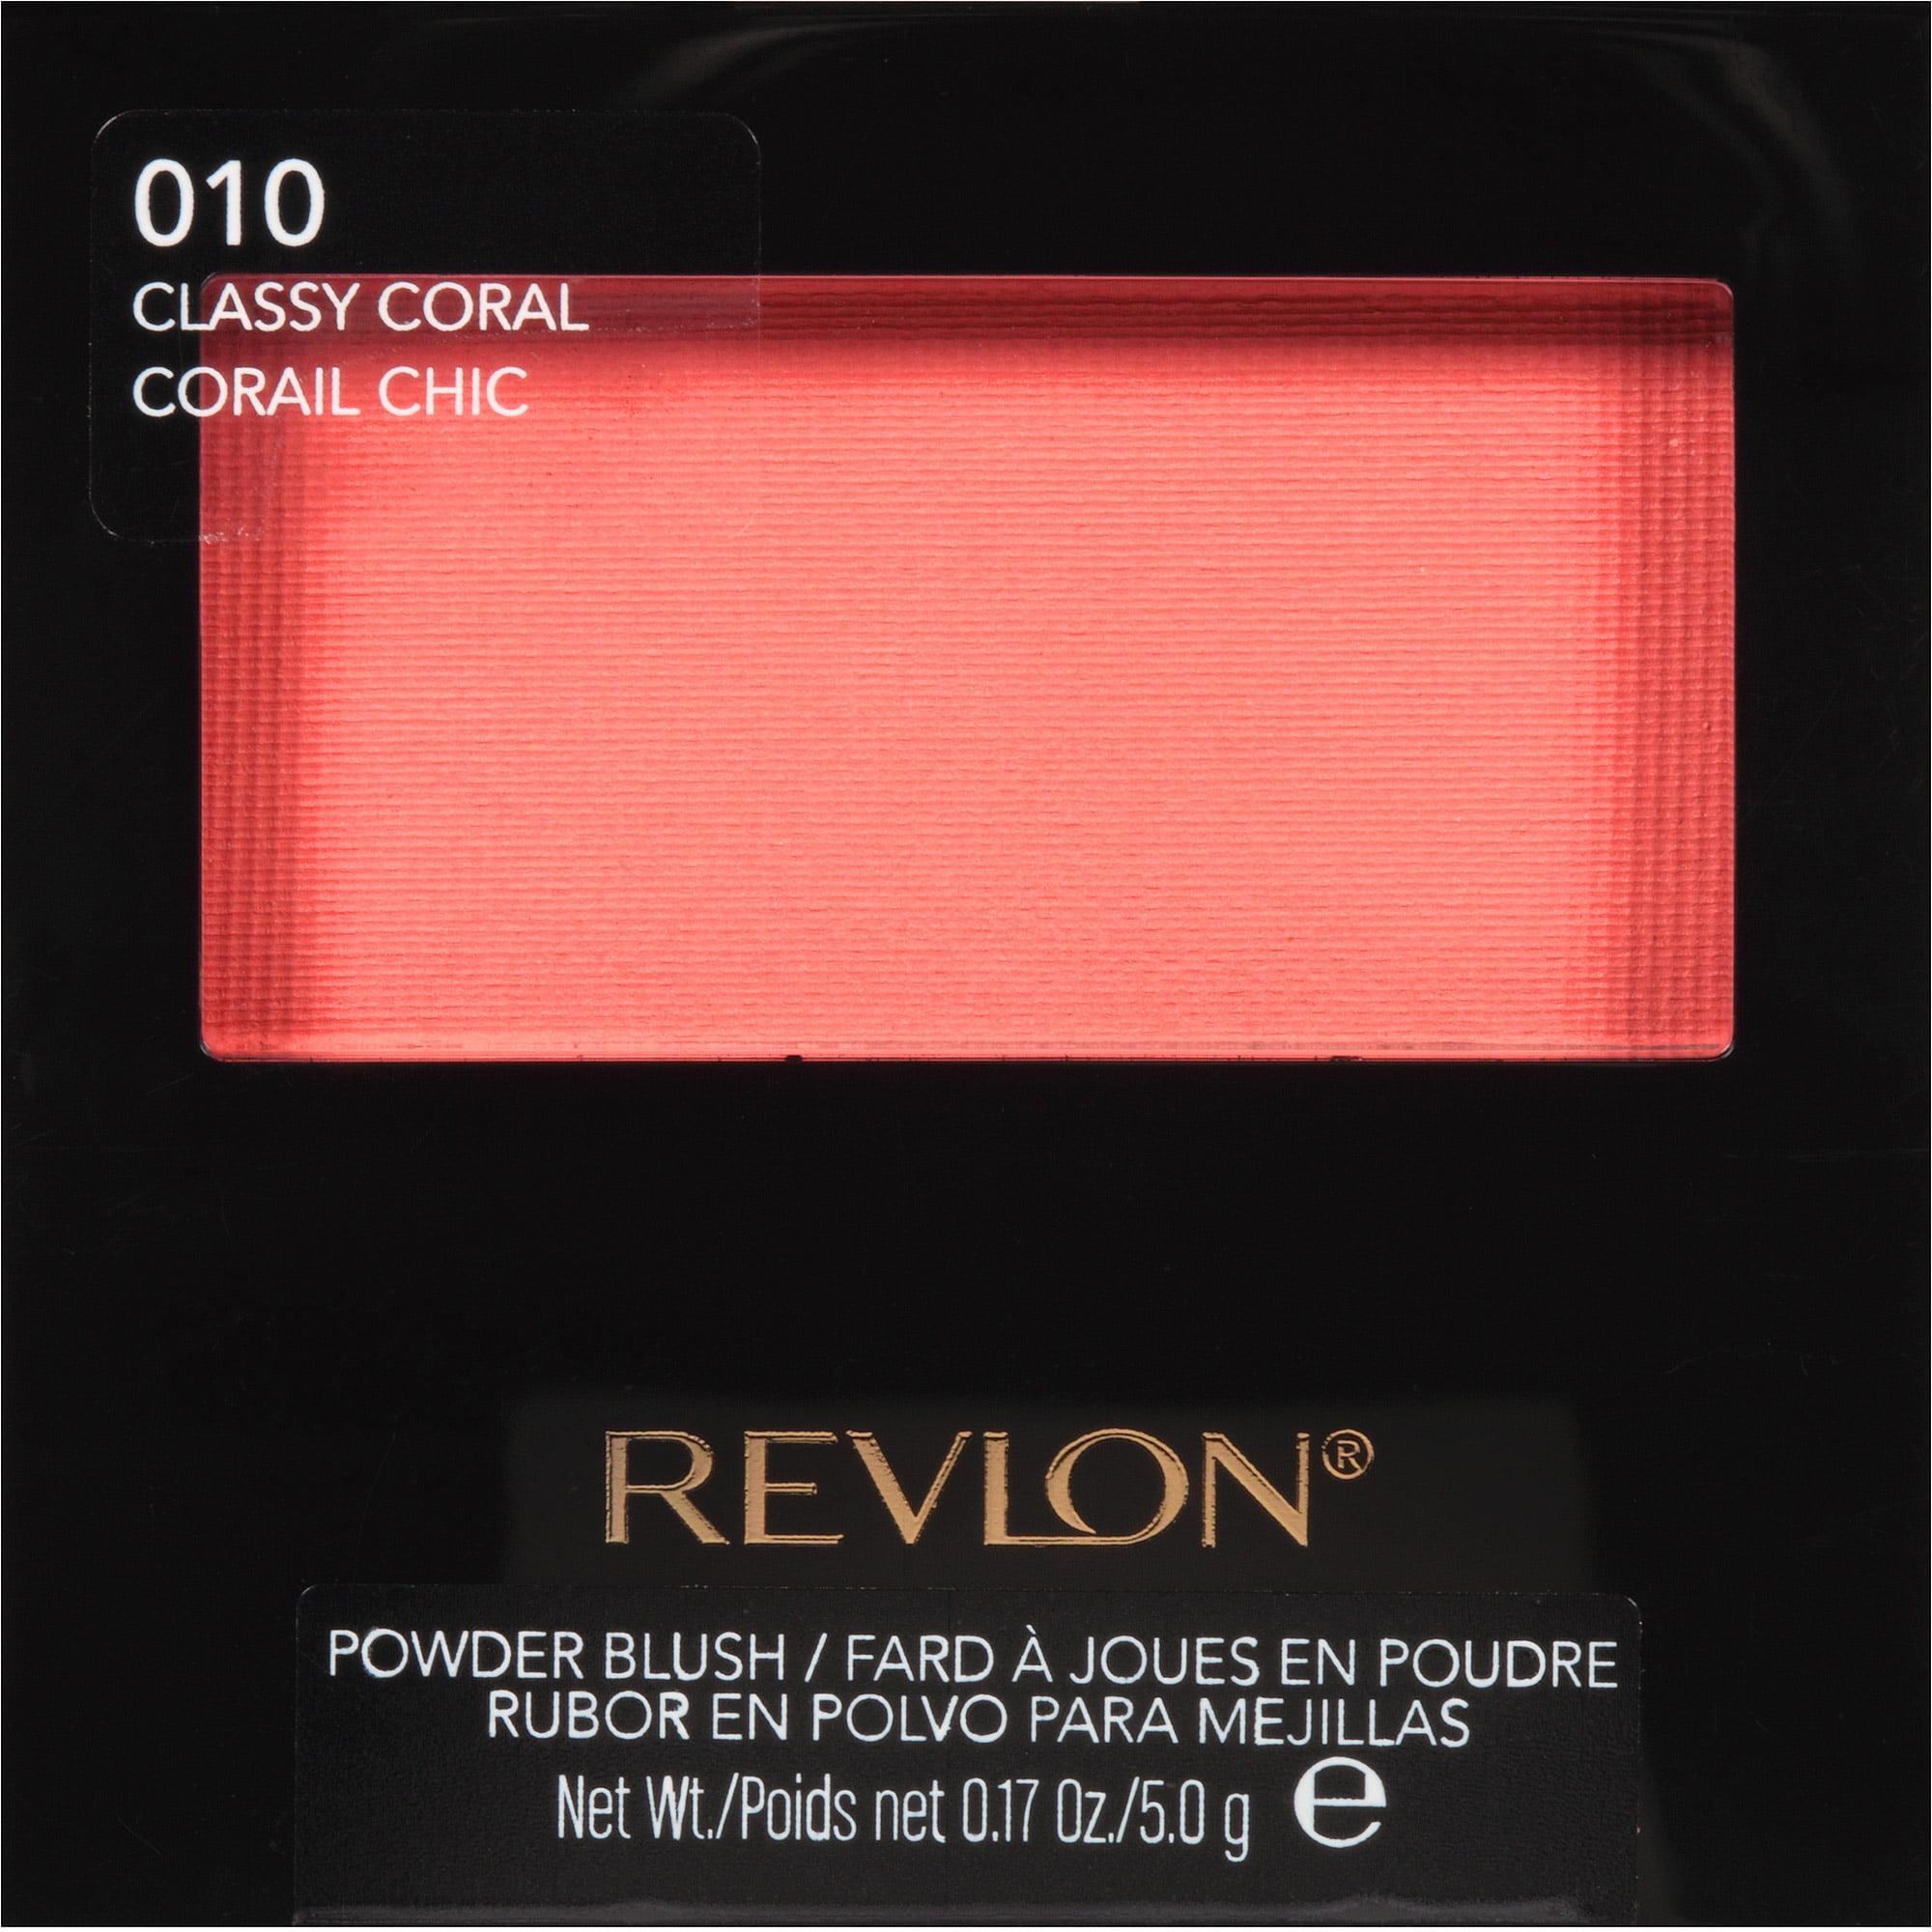 Revlon Revlon Powder Blush, 0.17 oz